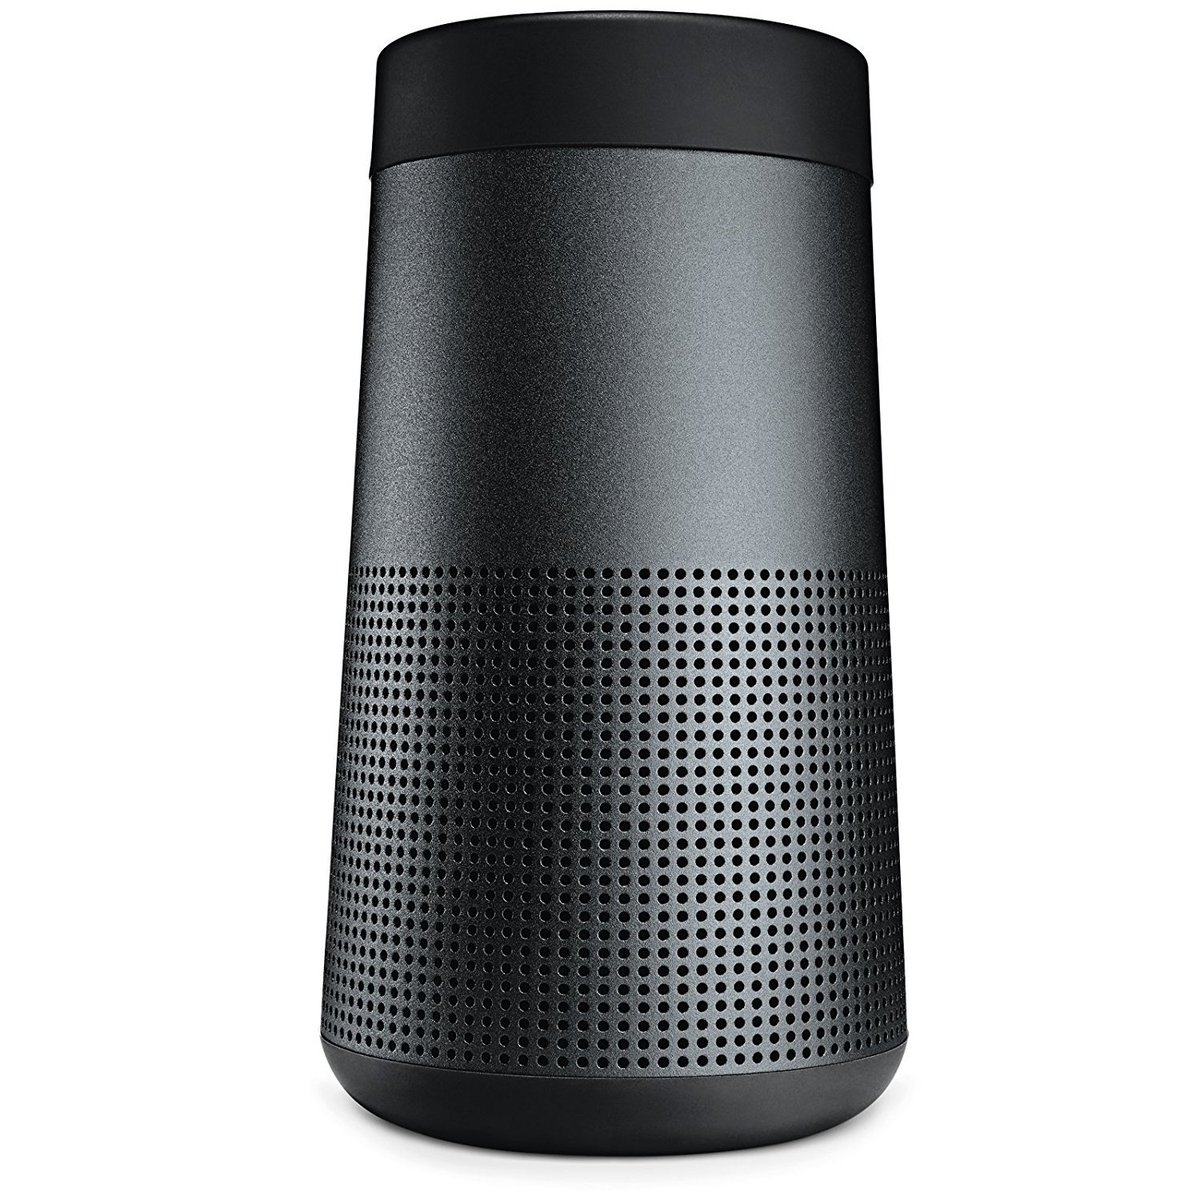 #Amazon Bose SoundLink Revolve #Bluetooth #Speaker  $199.00  http:// amzn.to/2rE5TK2  &nbsp;   via @amazon #Smartphones <br>http://pic.twitter.com/FwcKyMlEYw